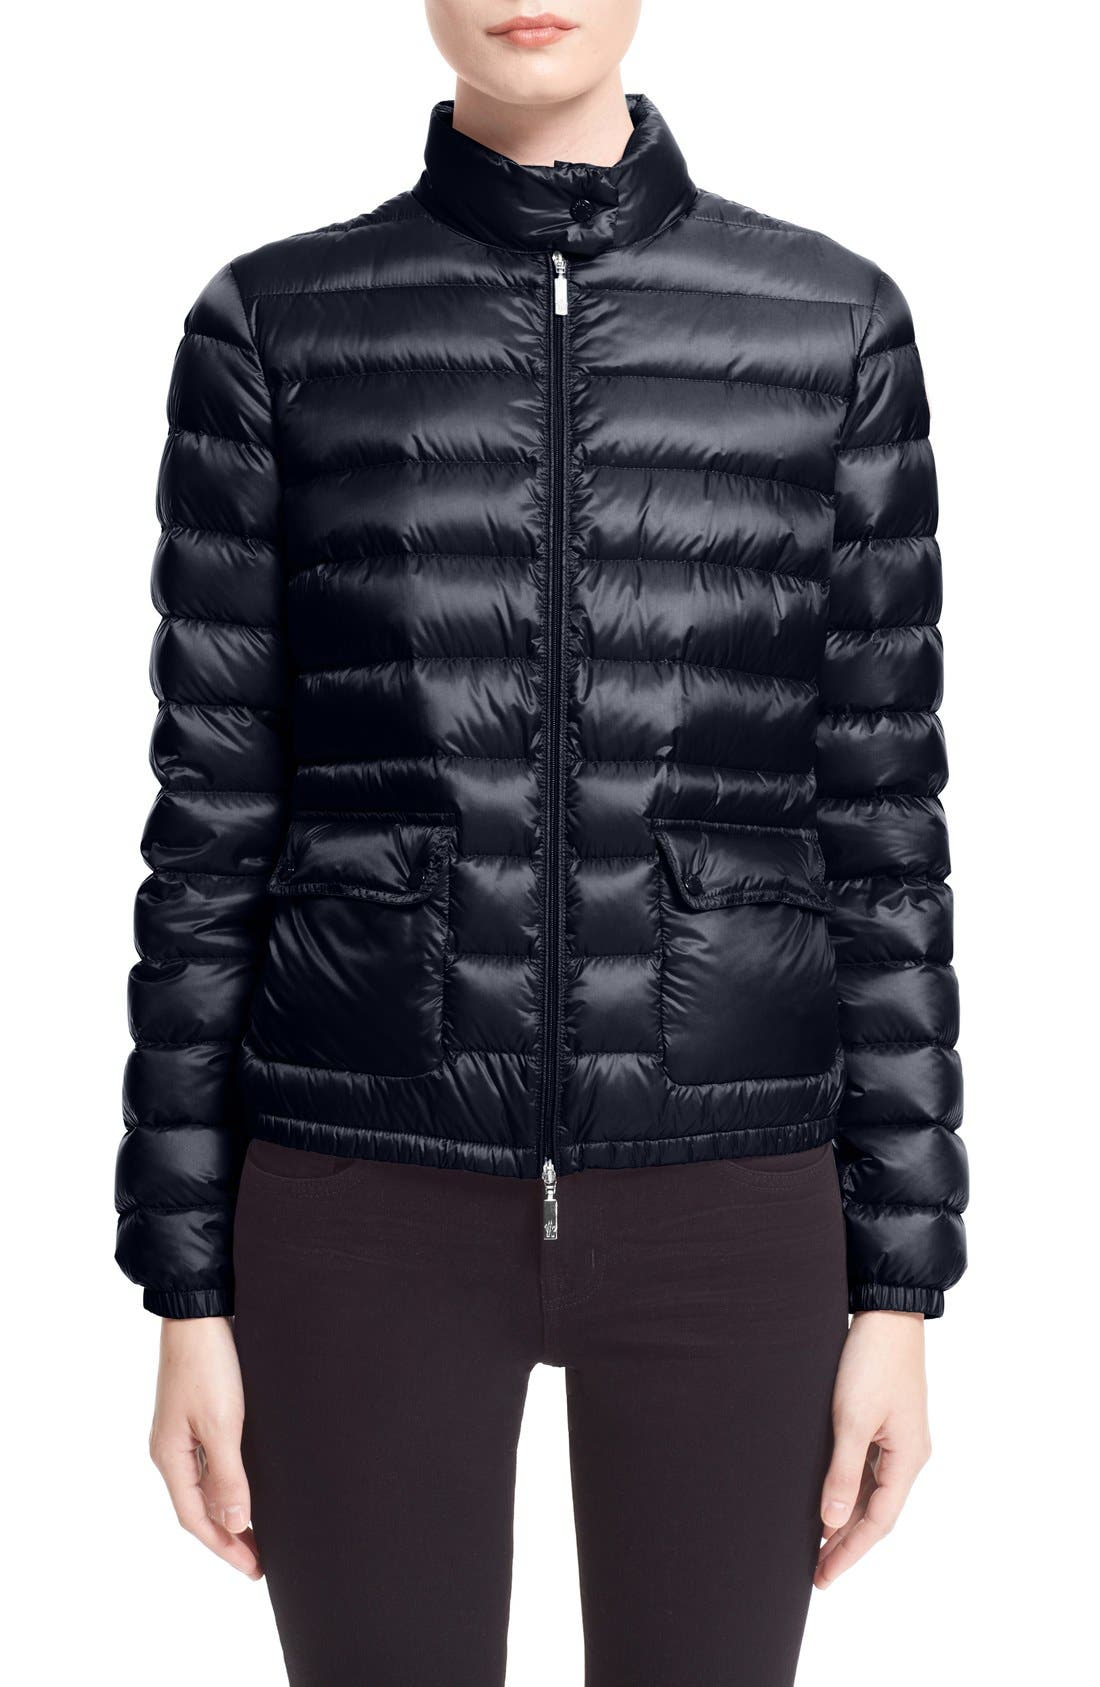 Alternate Image 1 Selected - Moncler 'Lans' Water Resistant Short Down Jacket